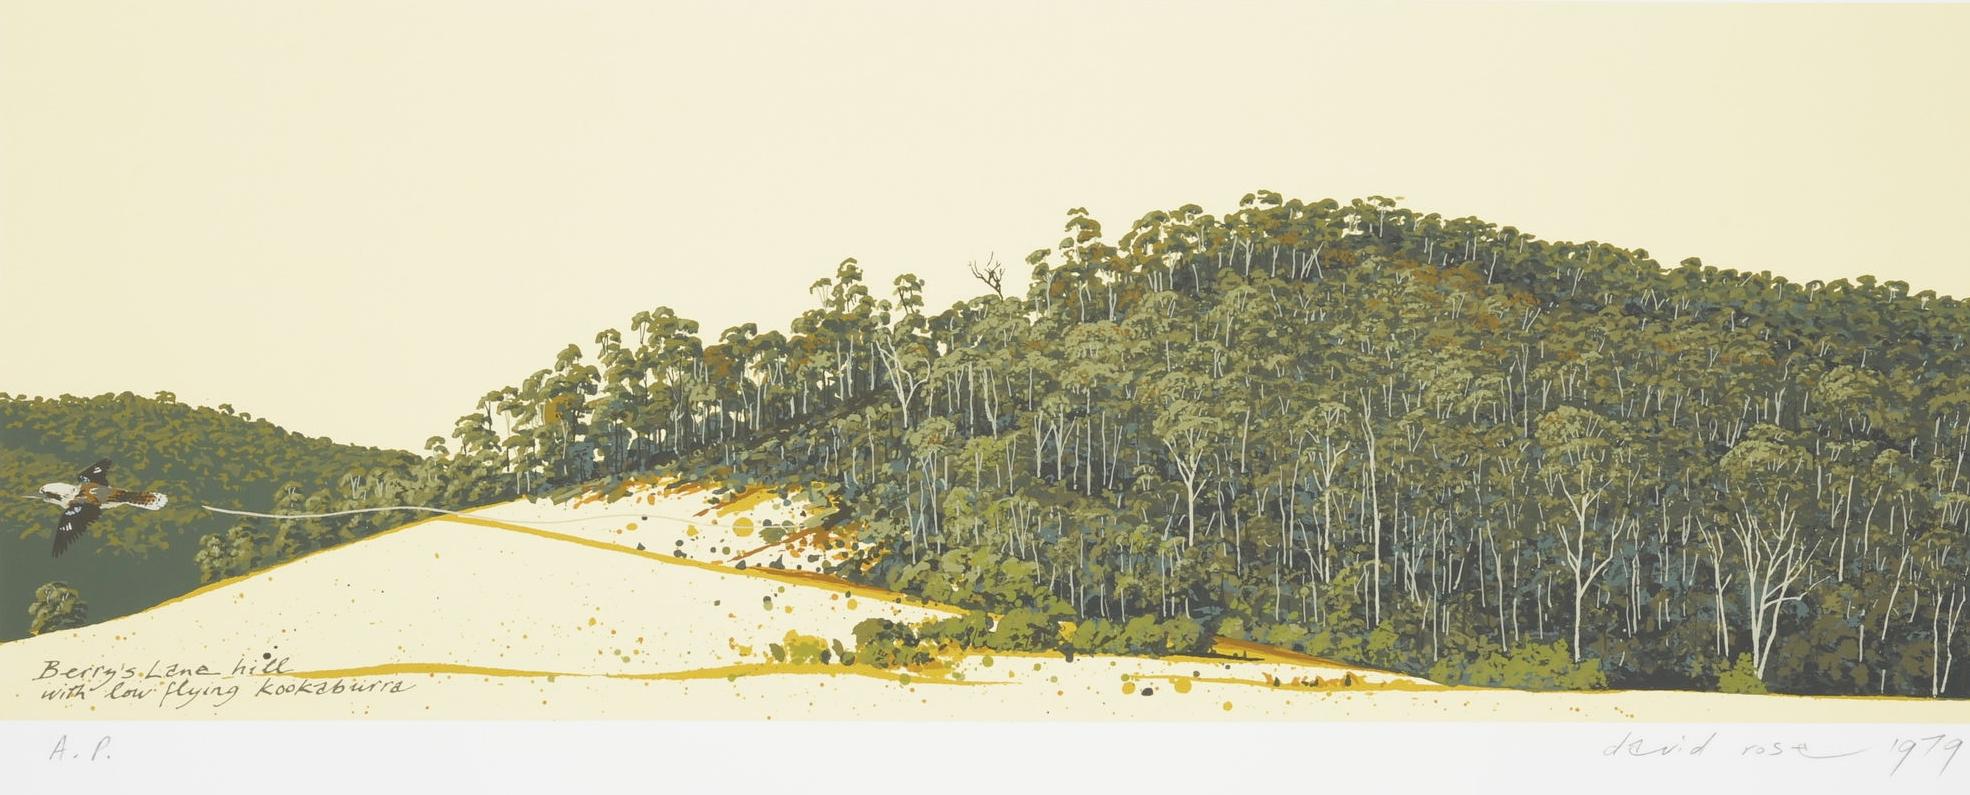 1979 Berry's Lane hill with low flying Kookaburra.JPG